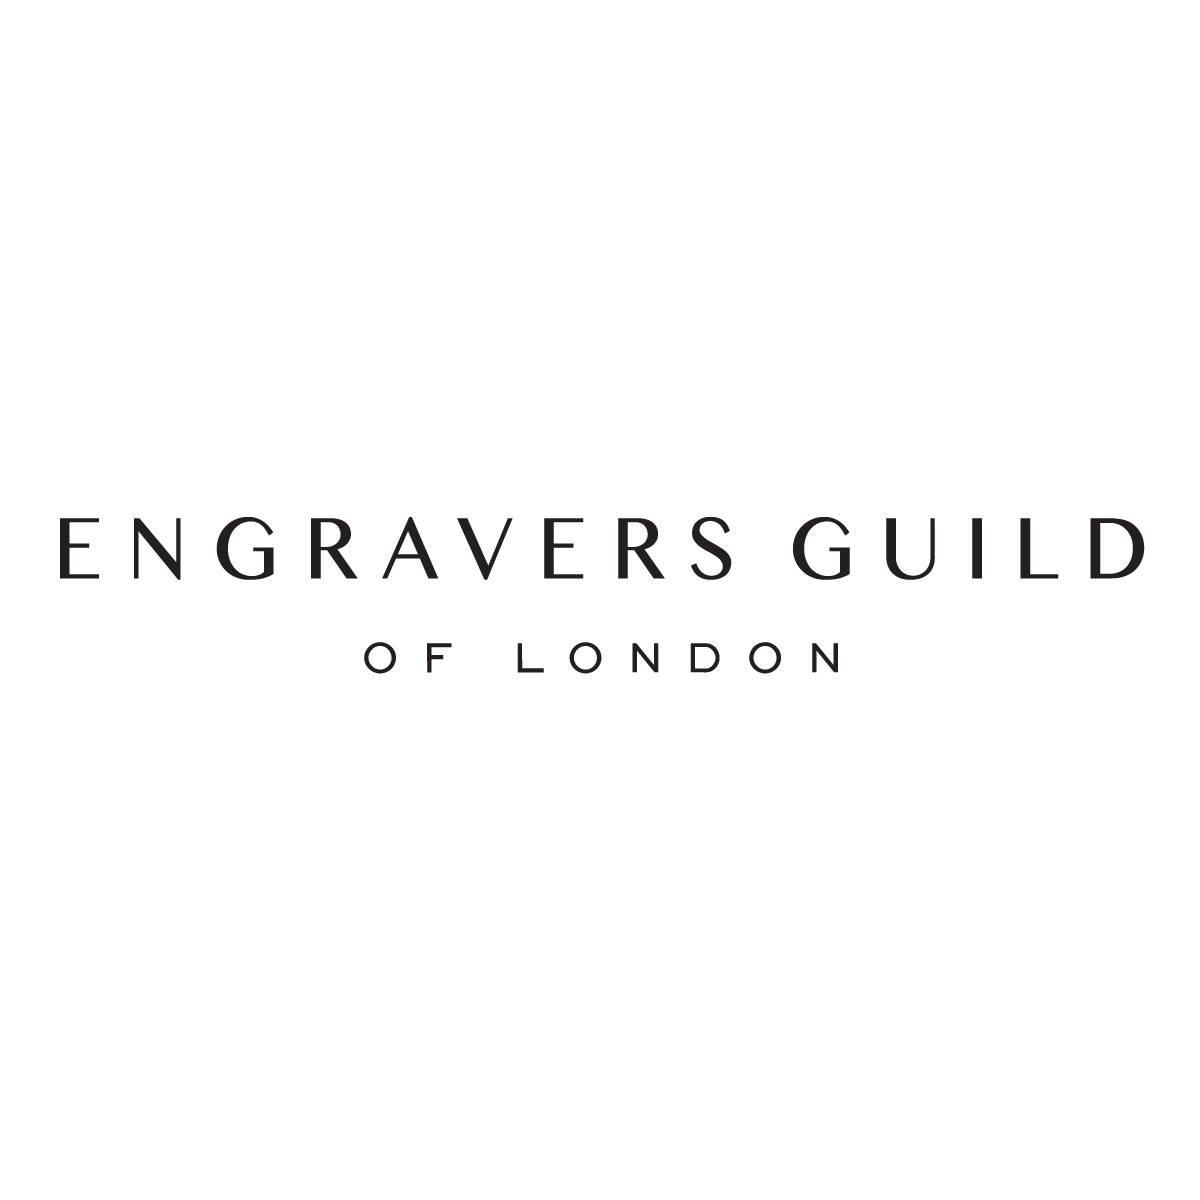 engraversguild.co.uk  logo